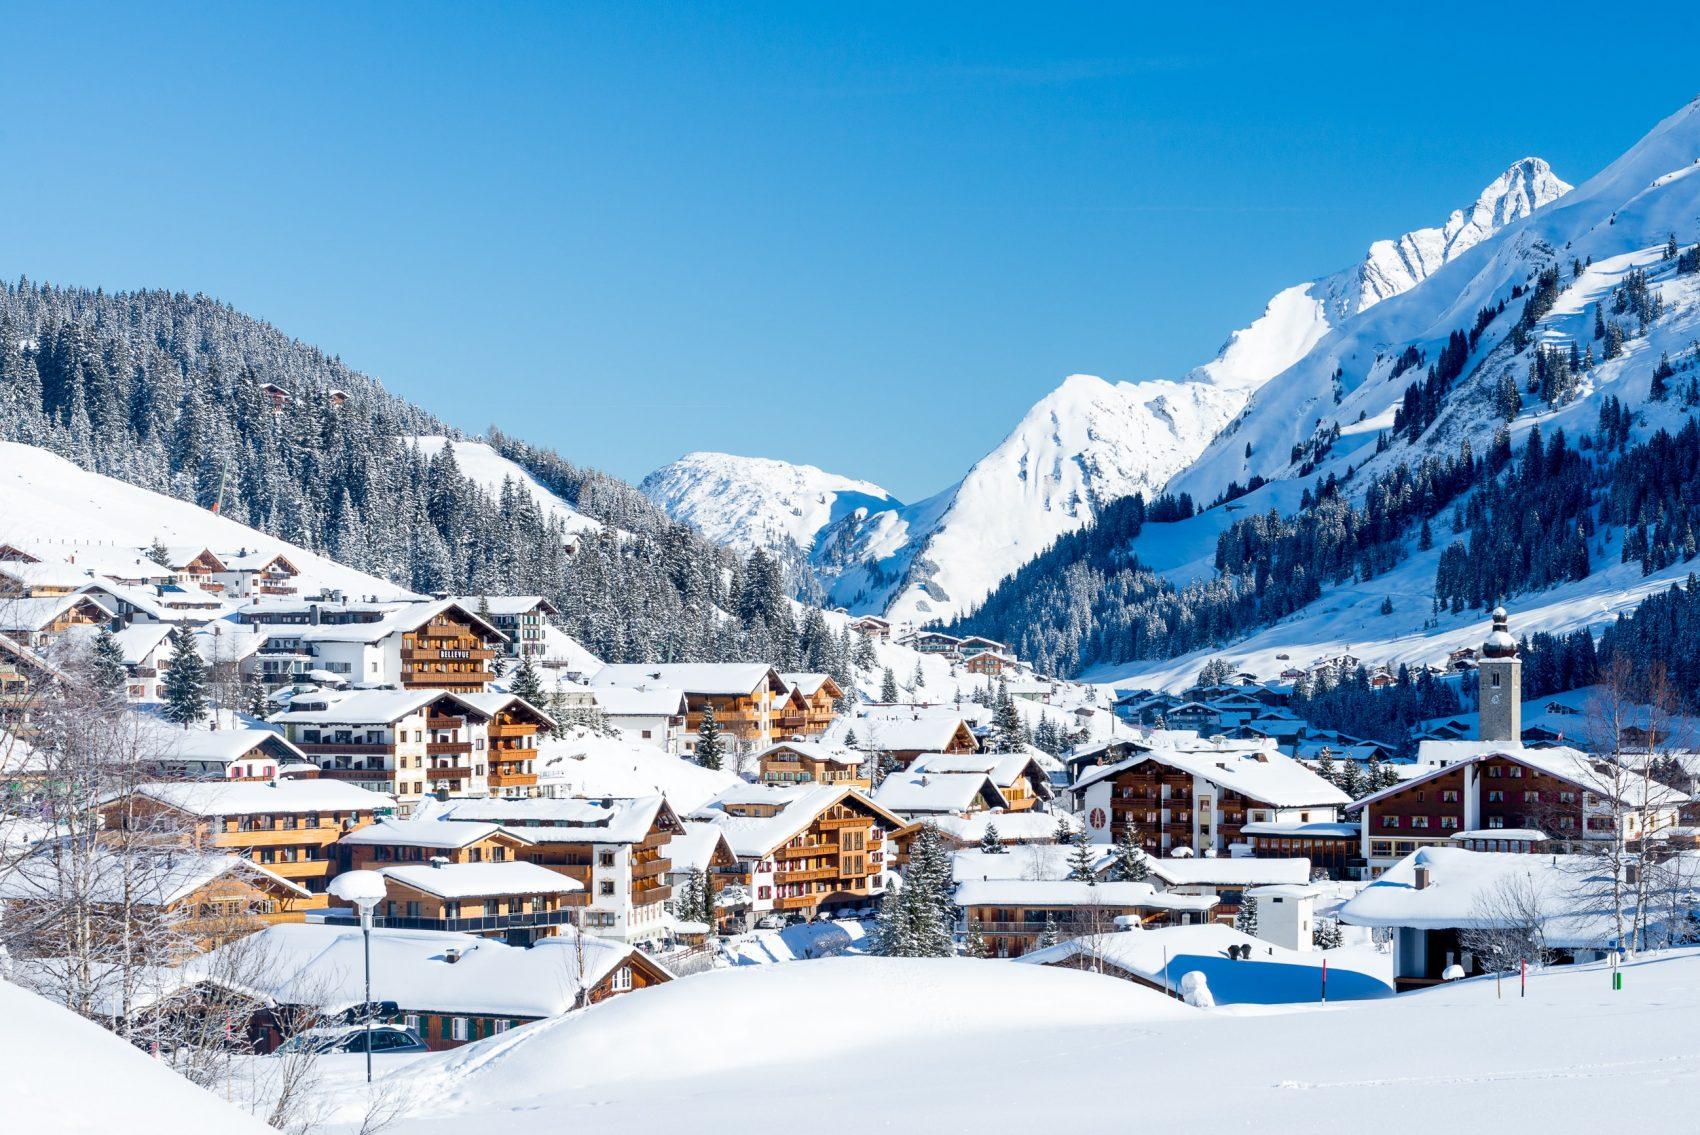 A Winter Village View over Lech, Austria